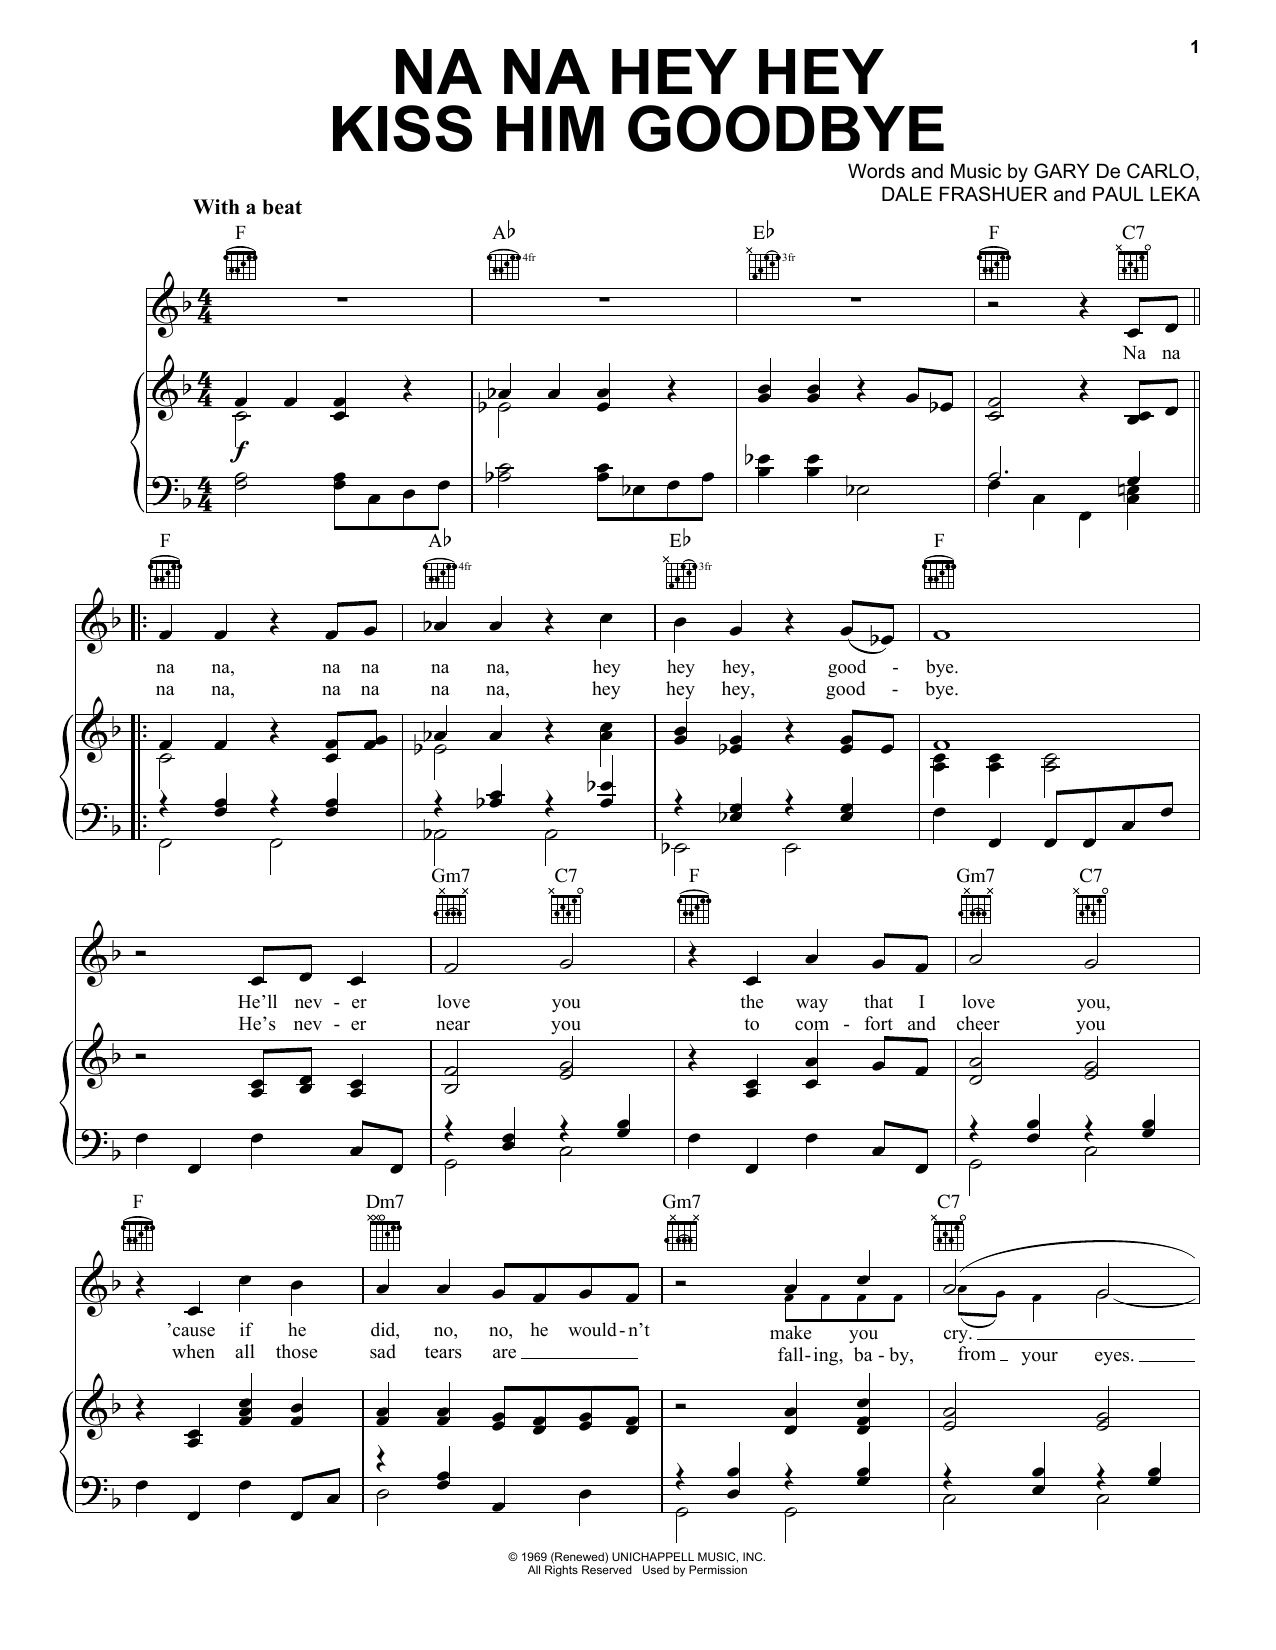 Steam Na Na Hey Hey Kiss Him Goodbye sheet music notes and chords. Download Printable PDF.